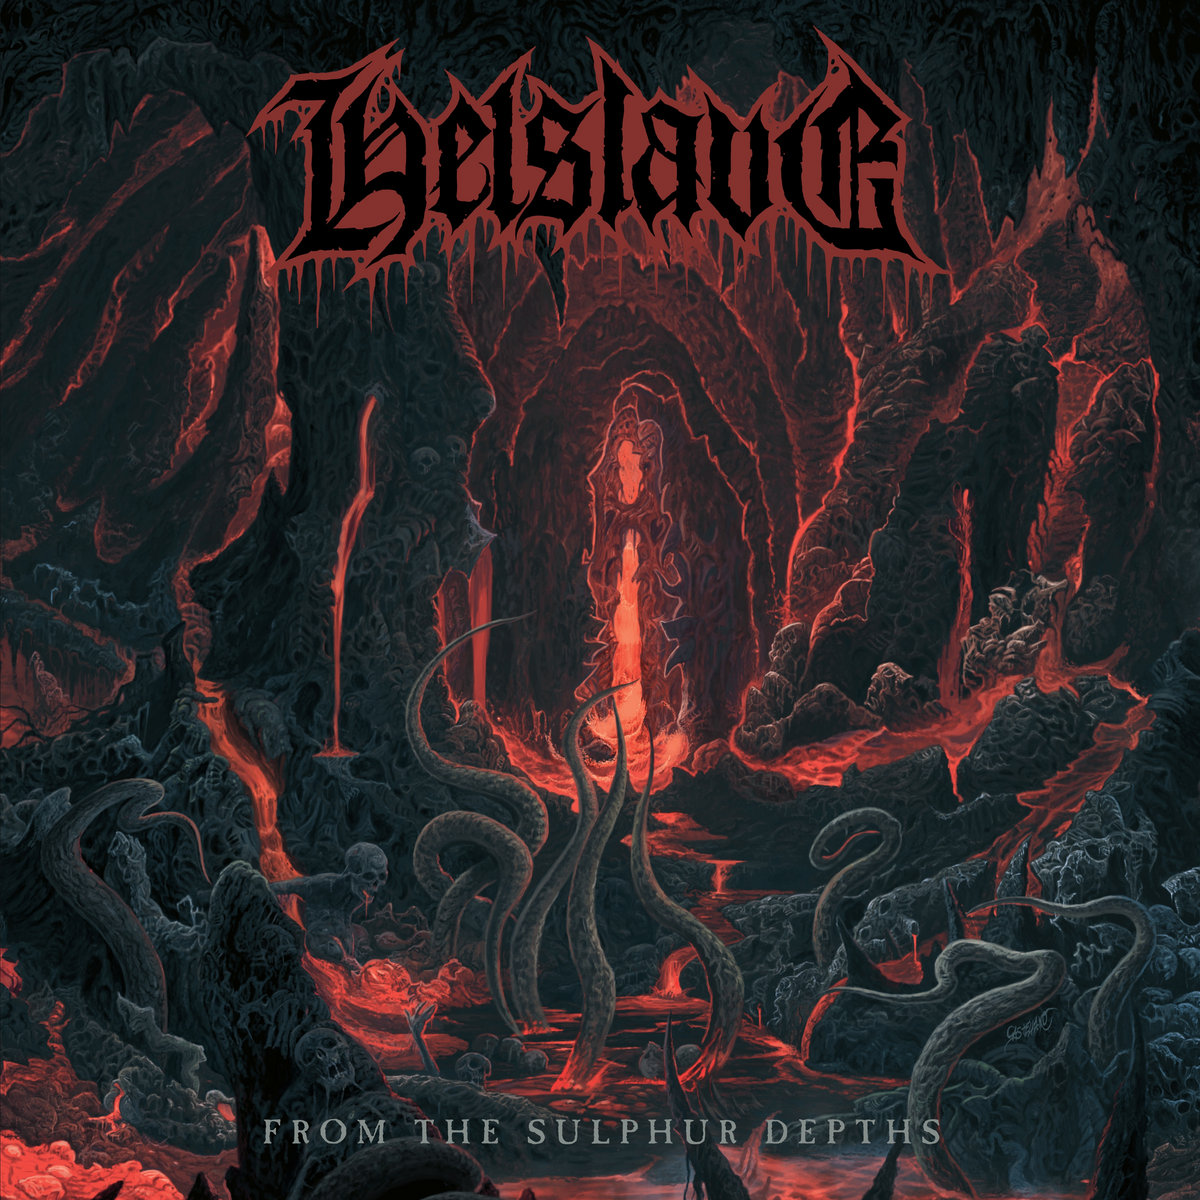 From The Sulphur Depths Helslave Album Cover Artwork